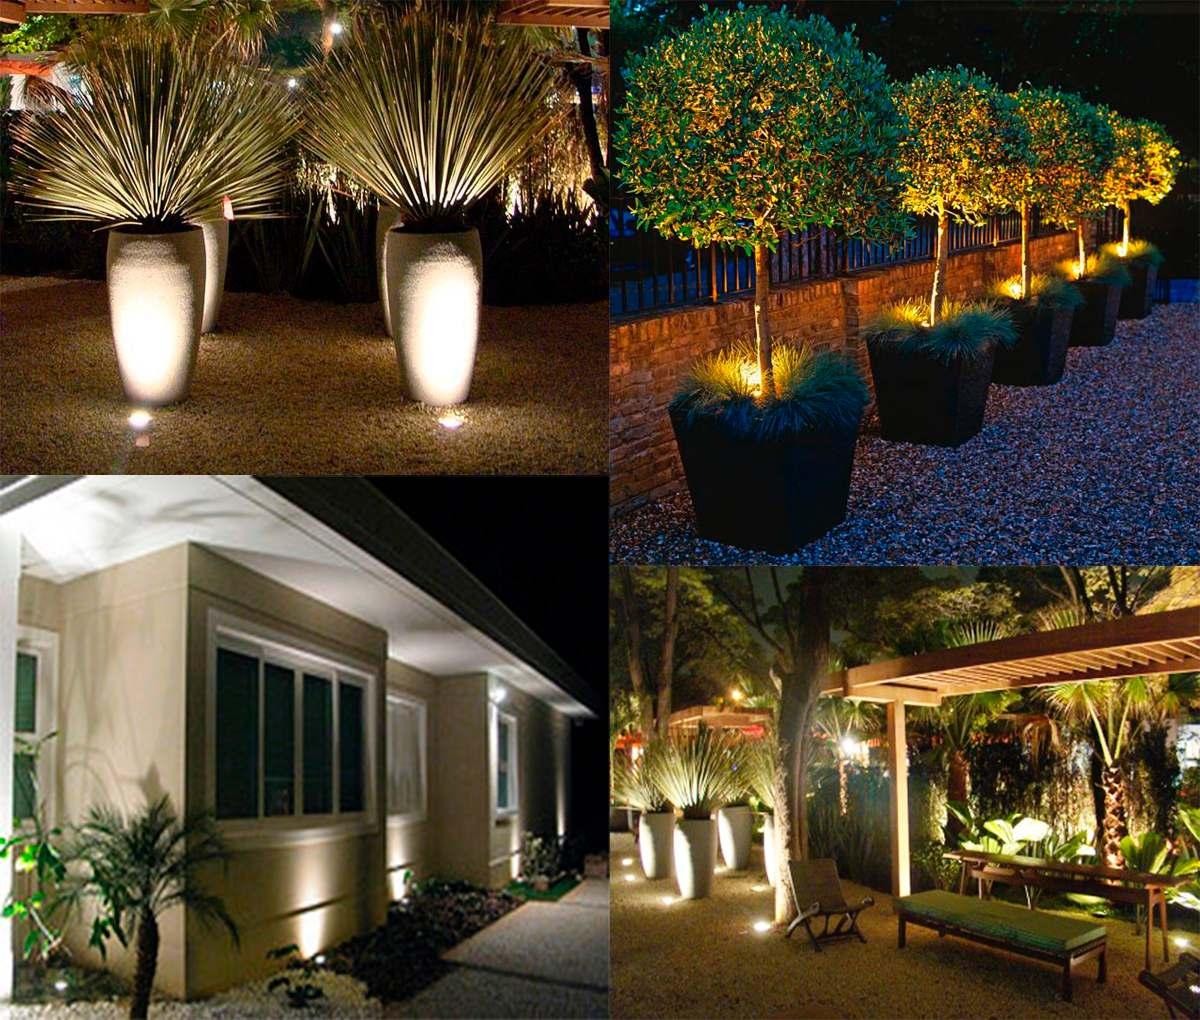 kit iluminacao jardim:Kit 10 Luminária Led Espeto De Jardim 5w De Potência Bivolt – R$ 490